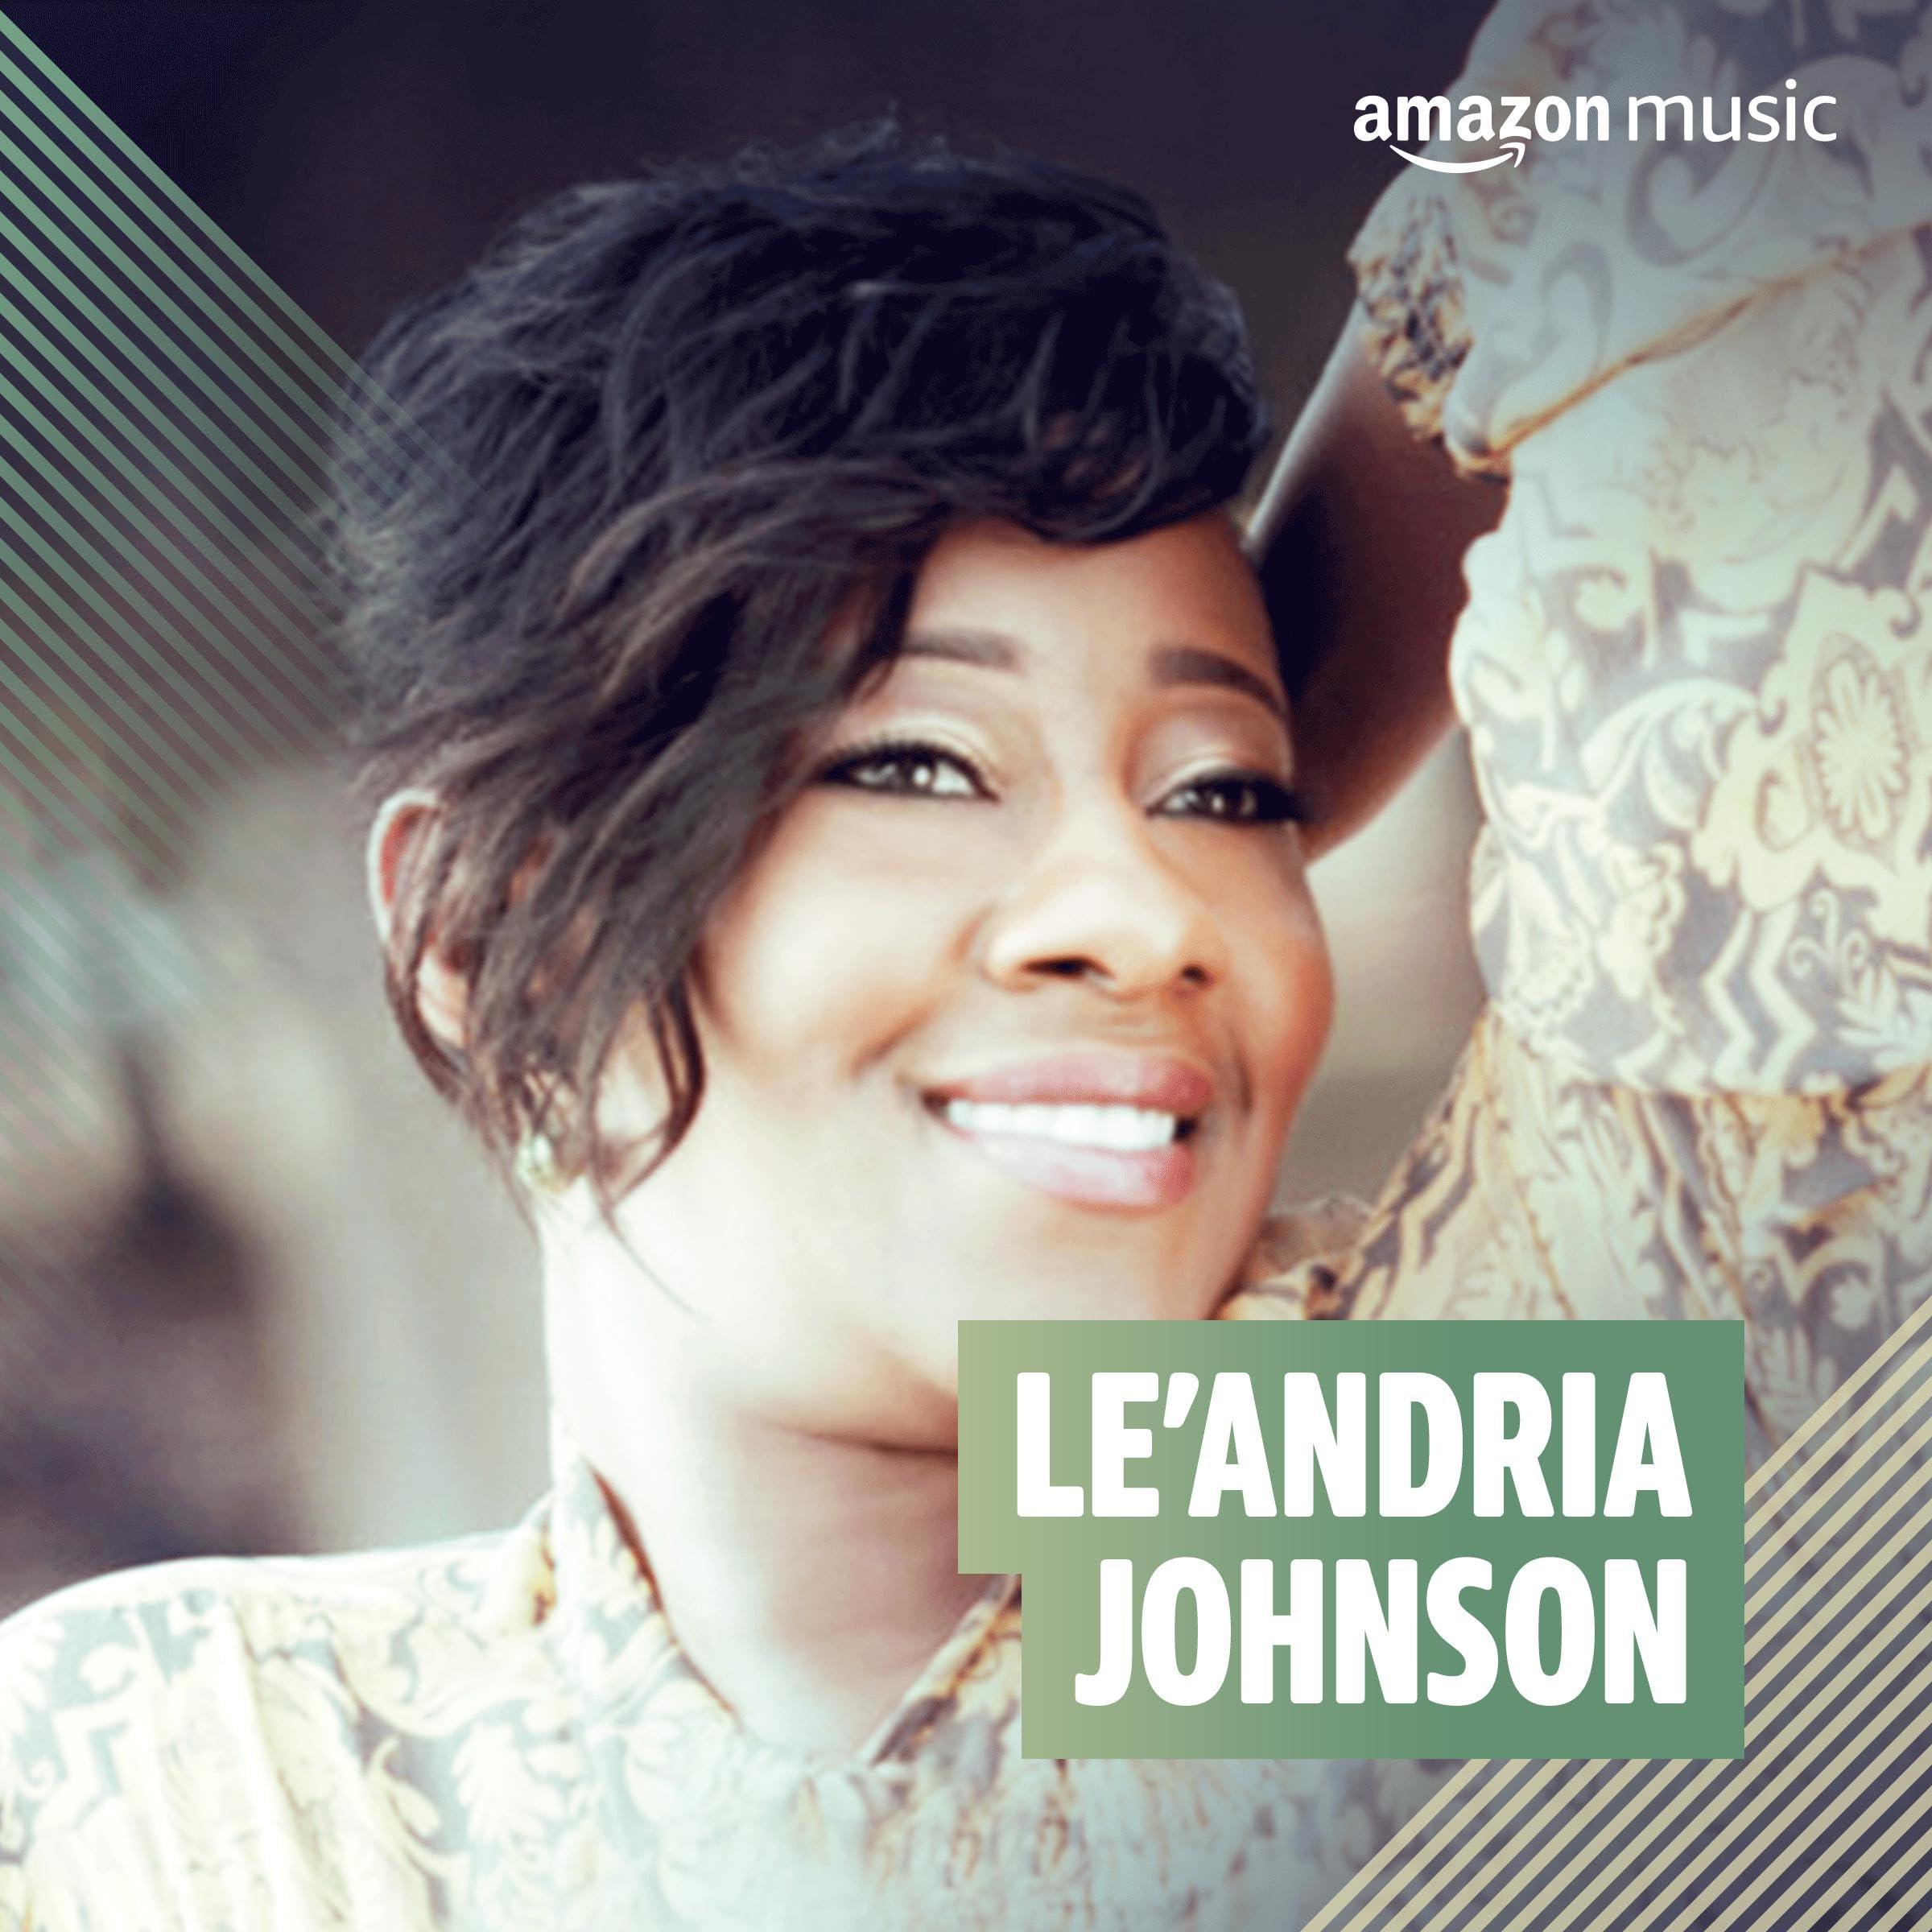 Le'Andria Johnson